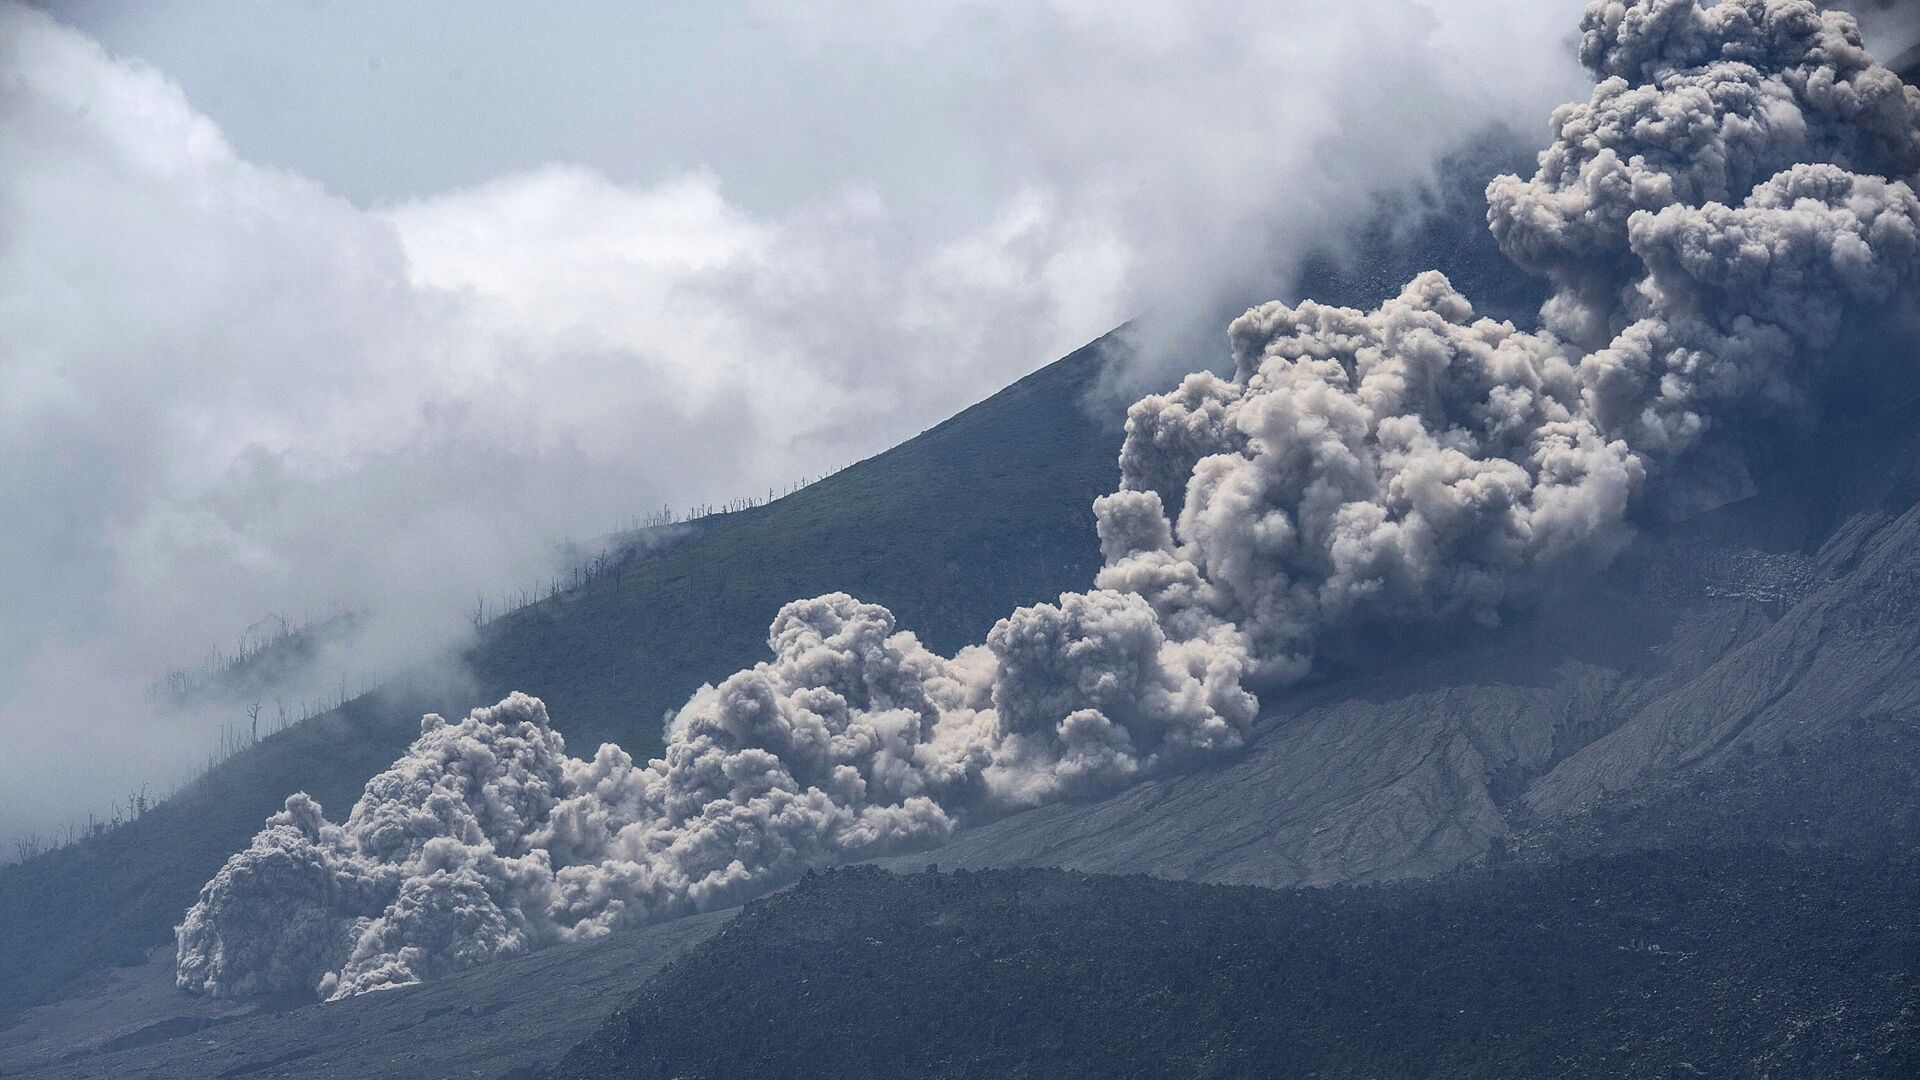 Извержение вулкана Синабунг в провинции Северная Суматра в Индонезии - РИА Новости, 1920, 19.09.2021